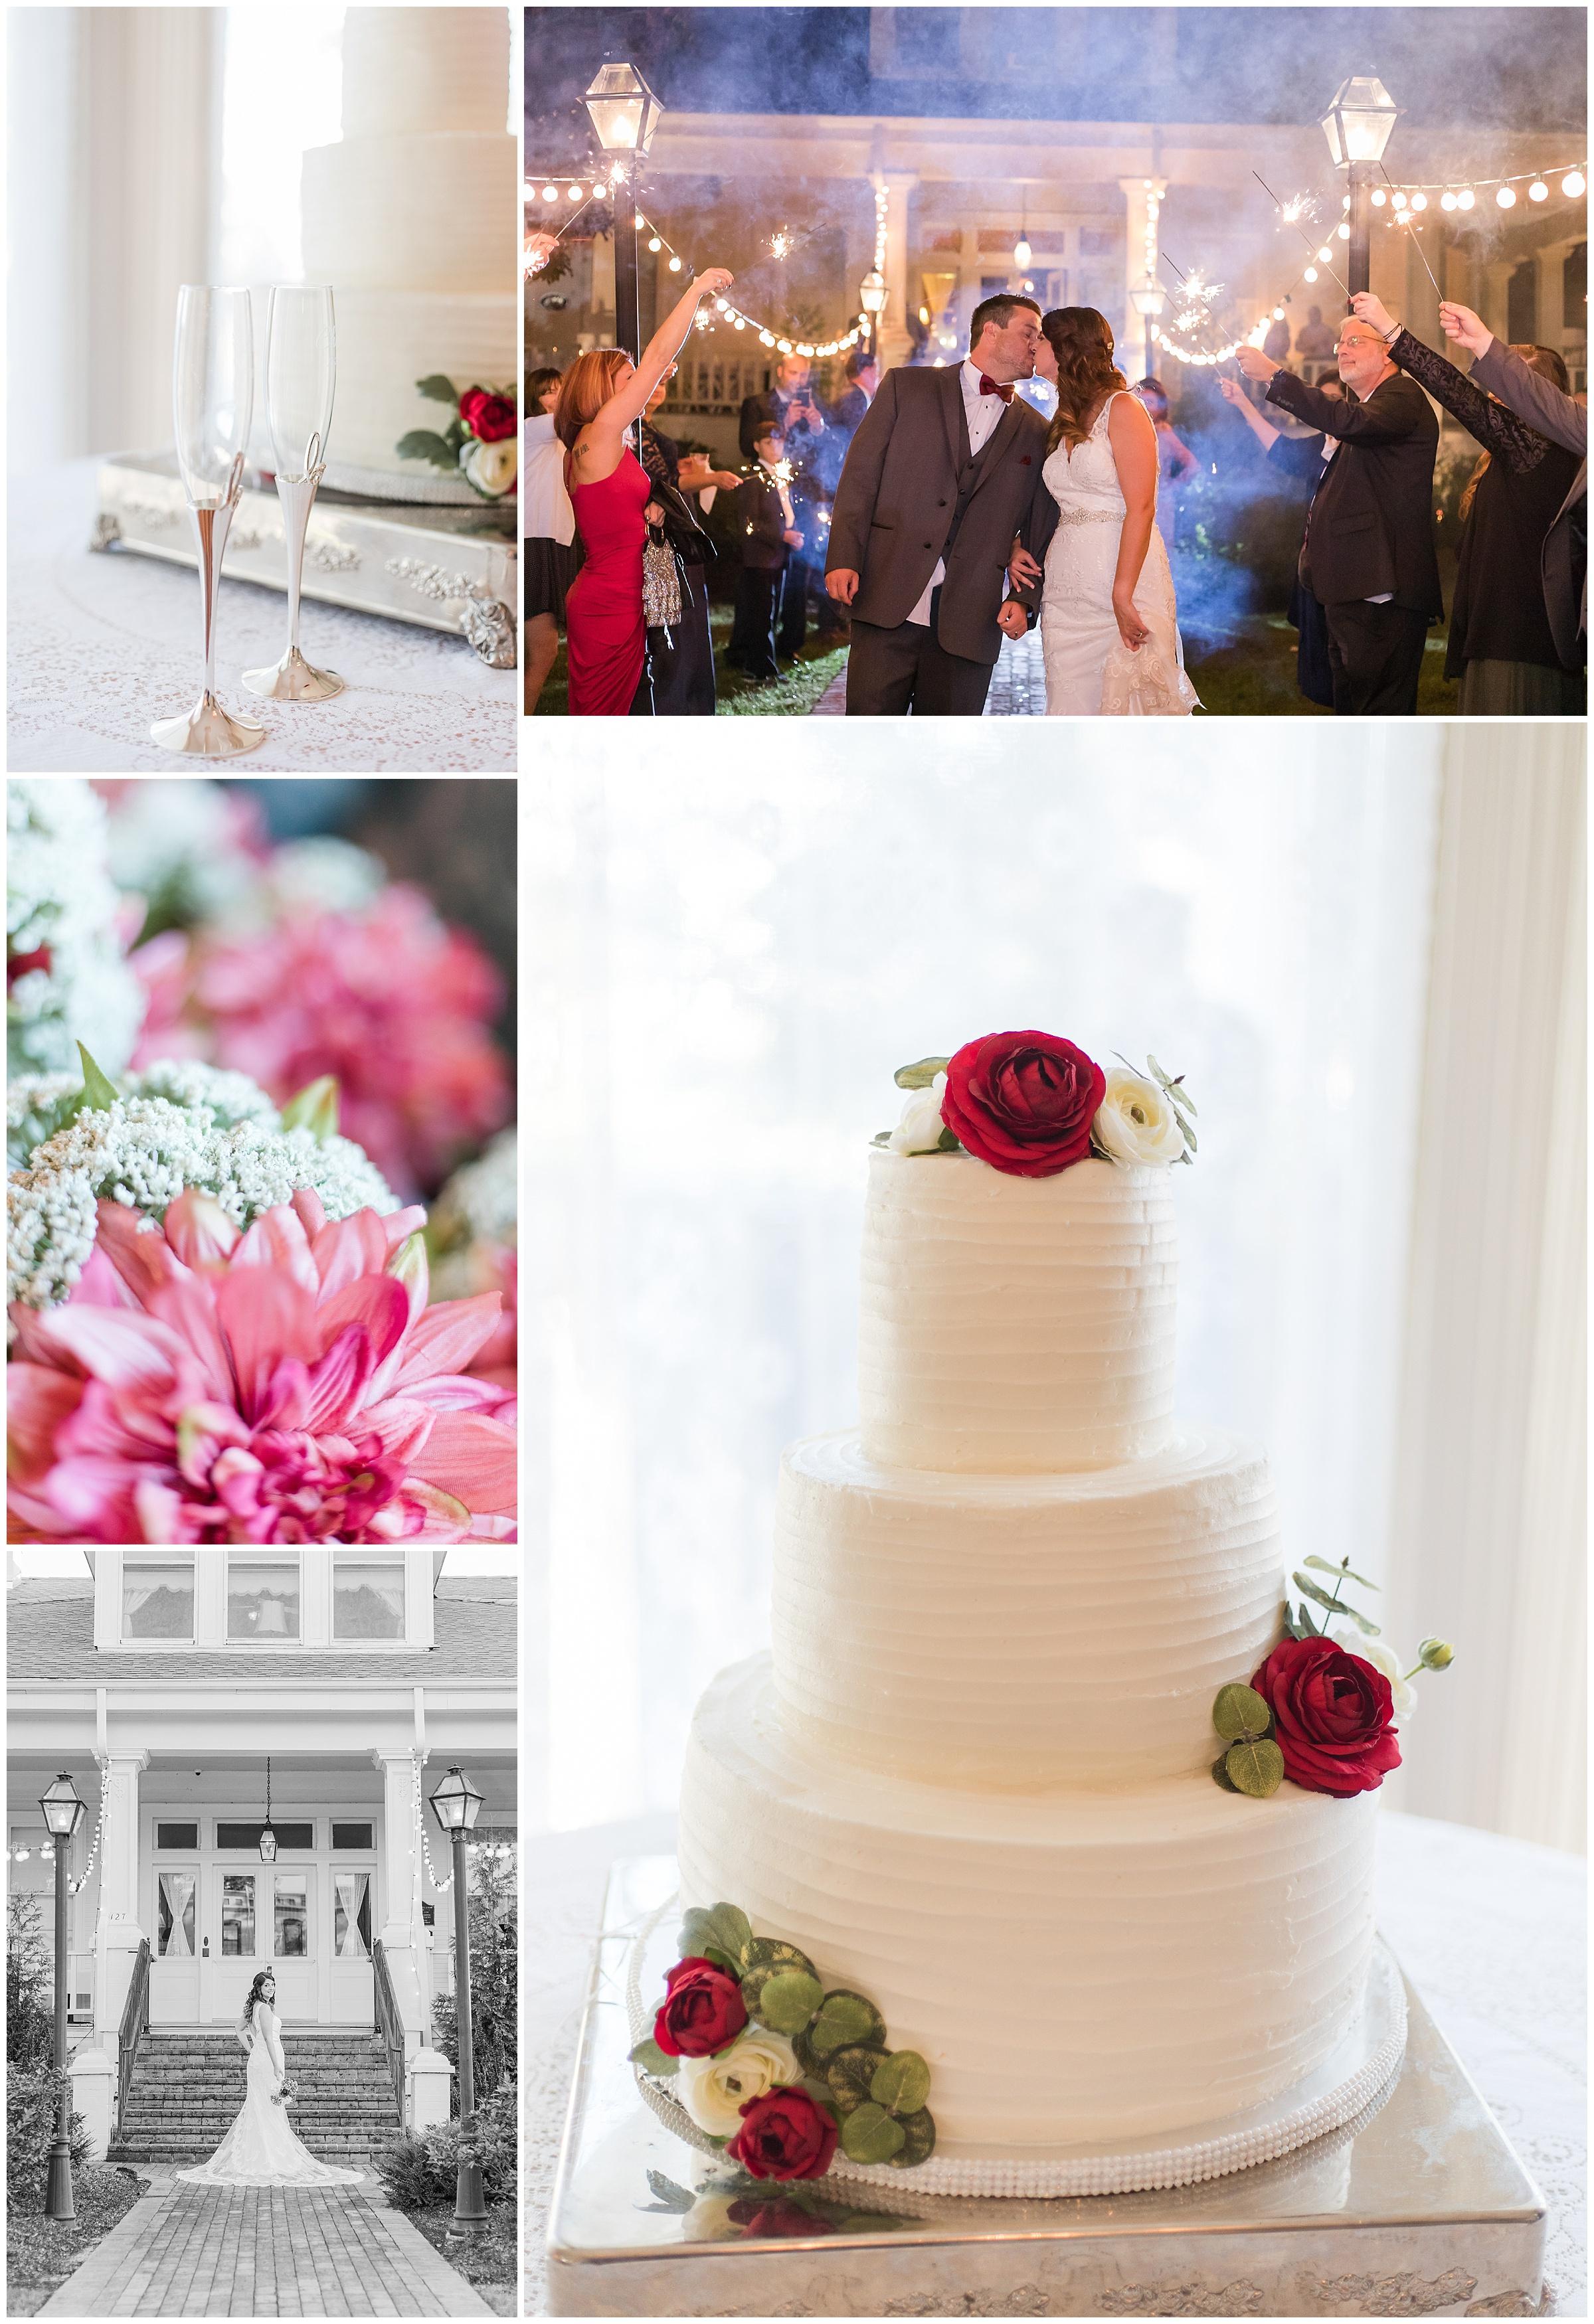 Bridget + Chad | A Perfect Fall Wedding at The Salmen-Fritchie House